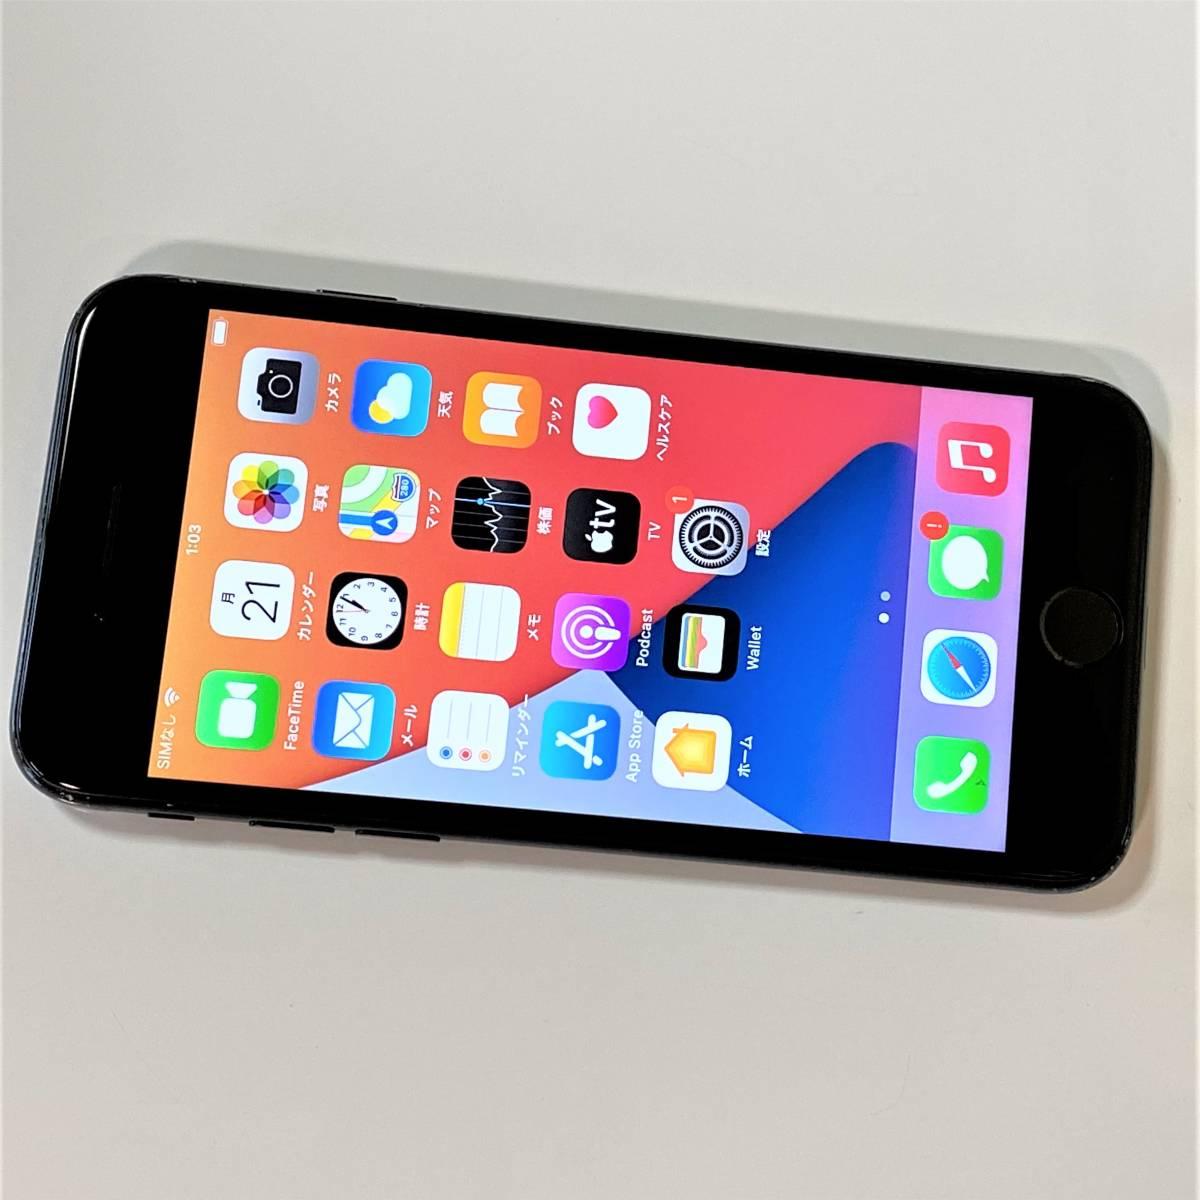 SIMフリー iPhone 7 ジェットブラック 128GB MNCP2J/A iOS14.0 docomo 格安SIM MVNO 海外利用可能 アクティベーションロック解除済